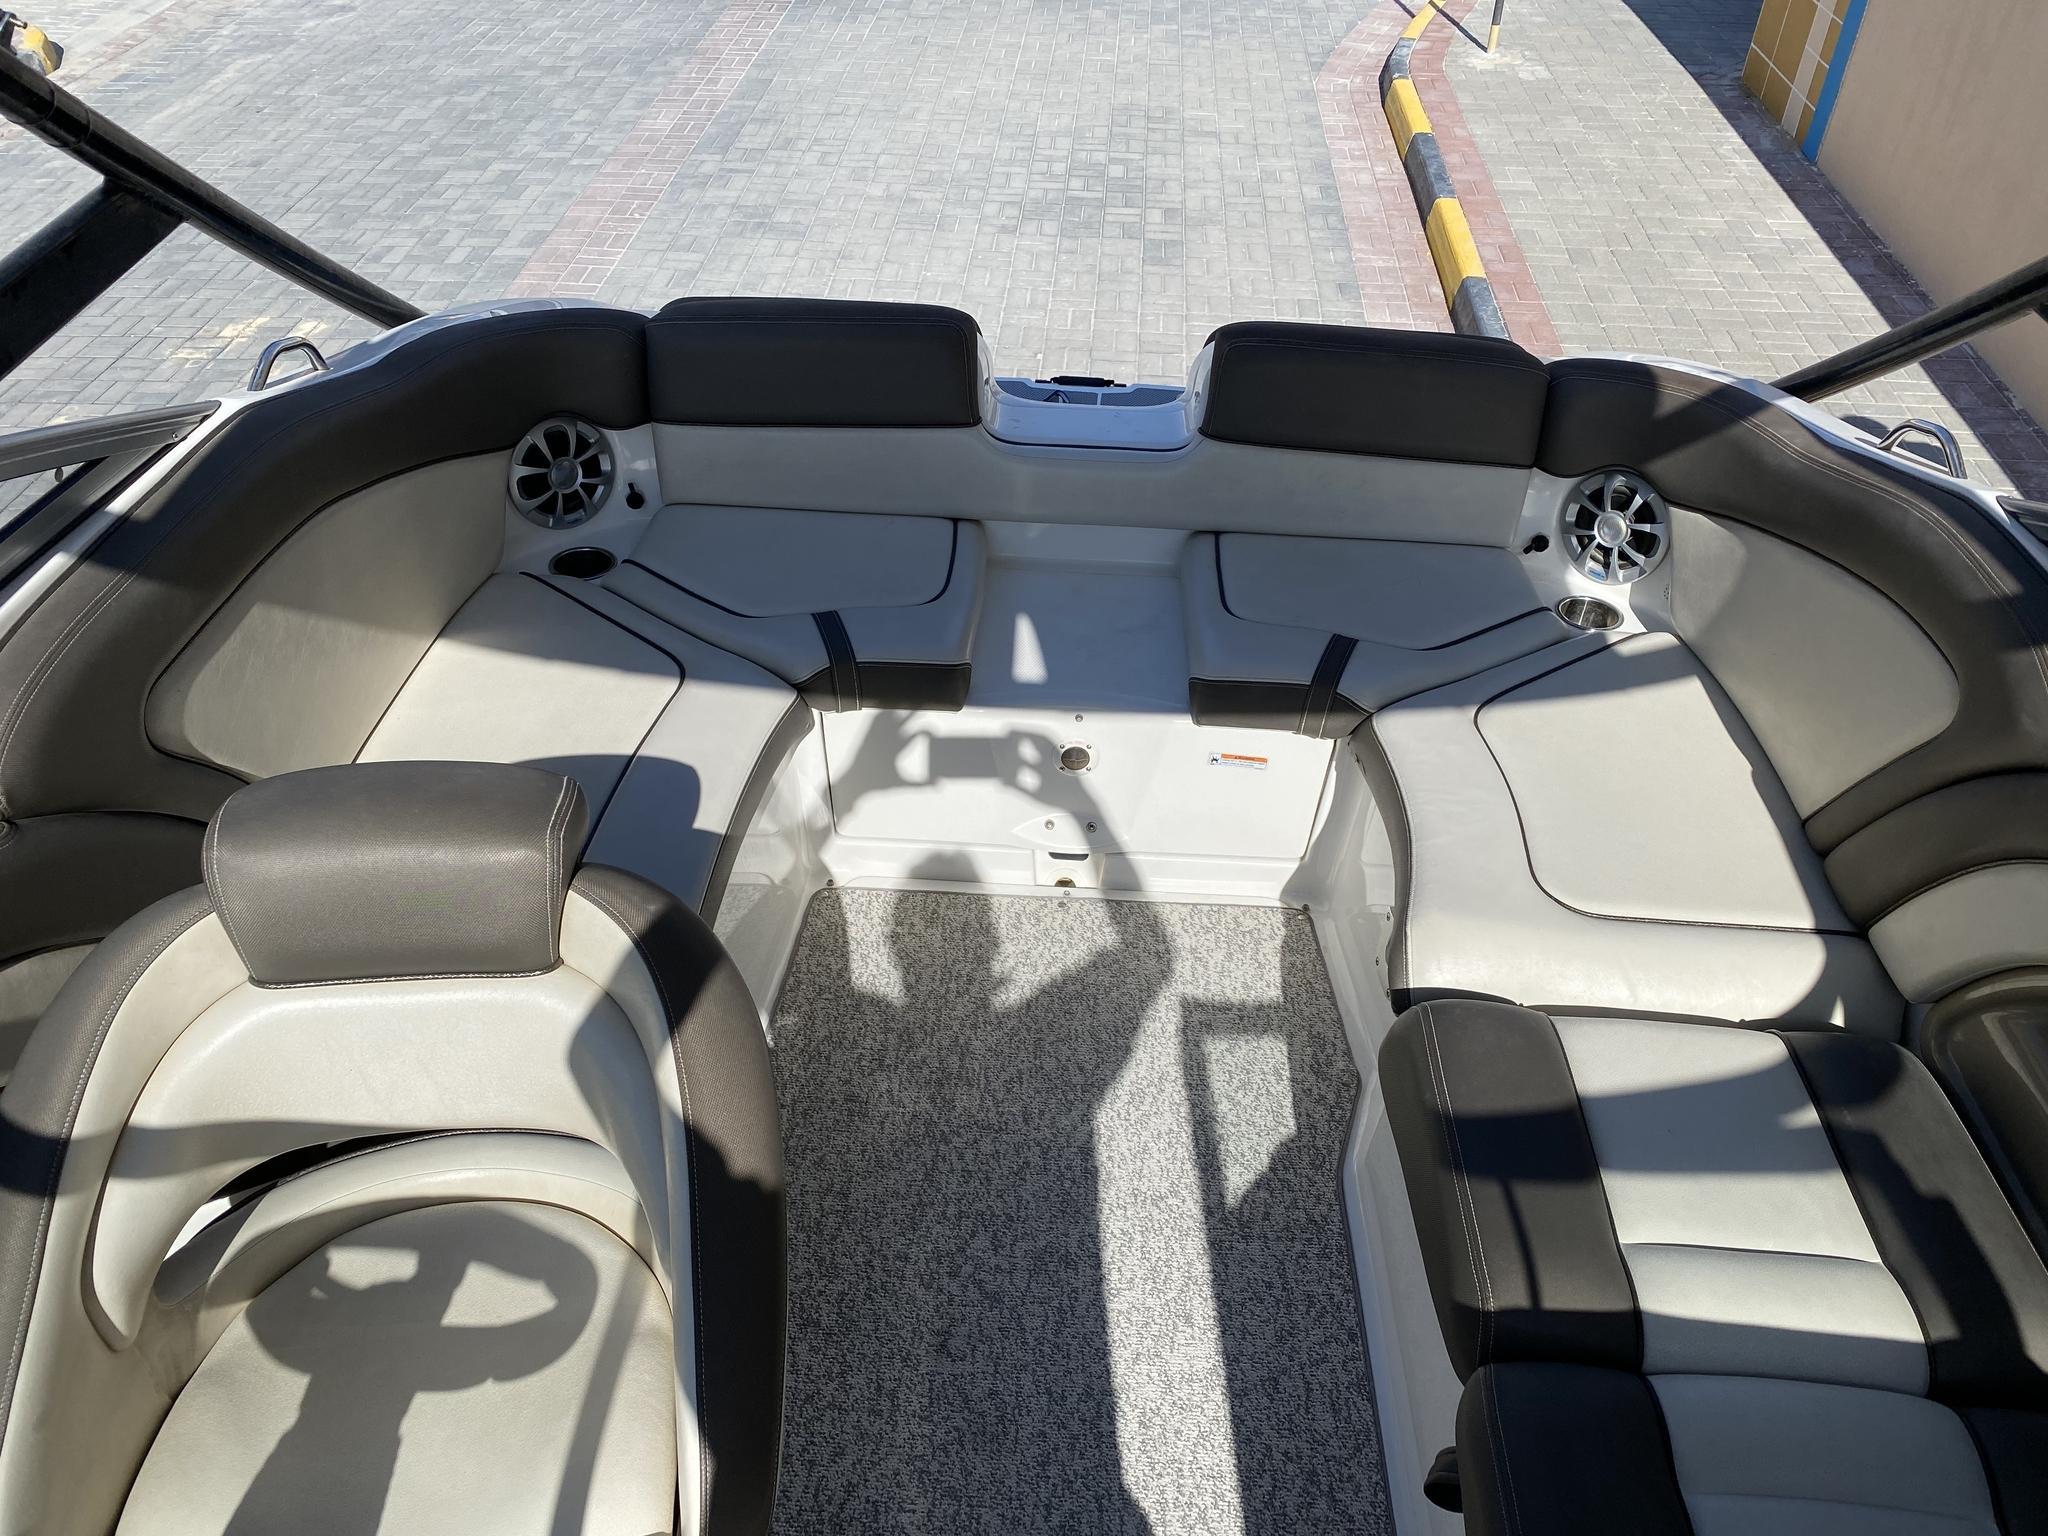 2012 Yamaha 242 Limited S Jet Boat